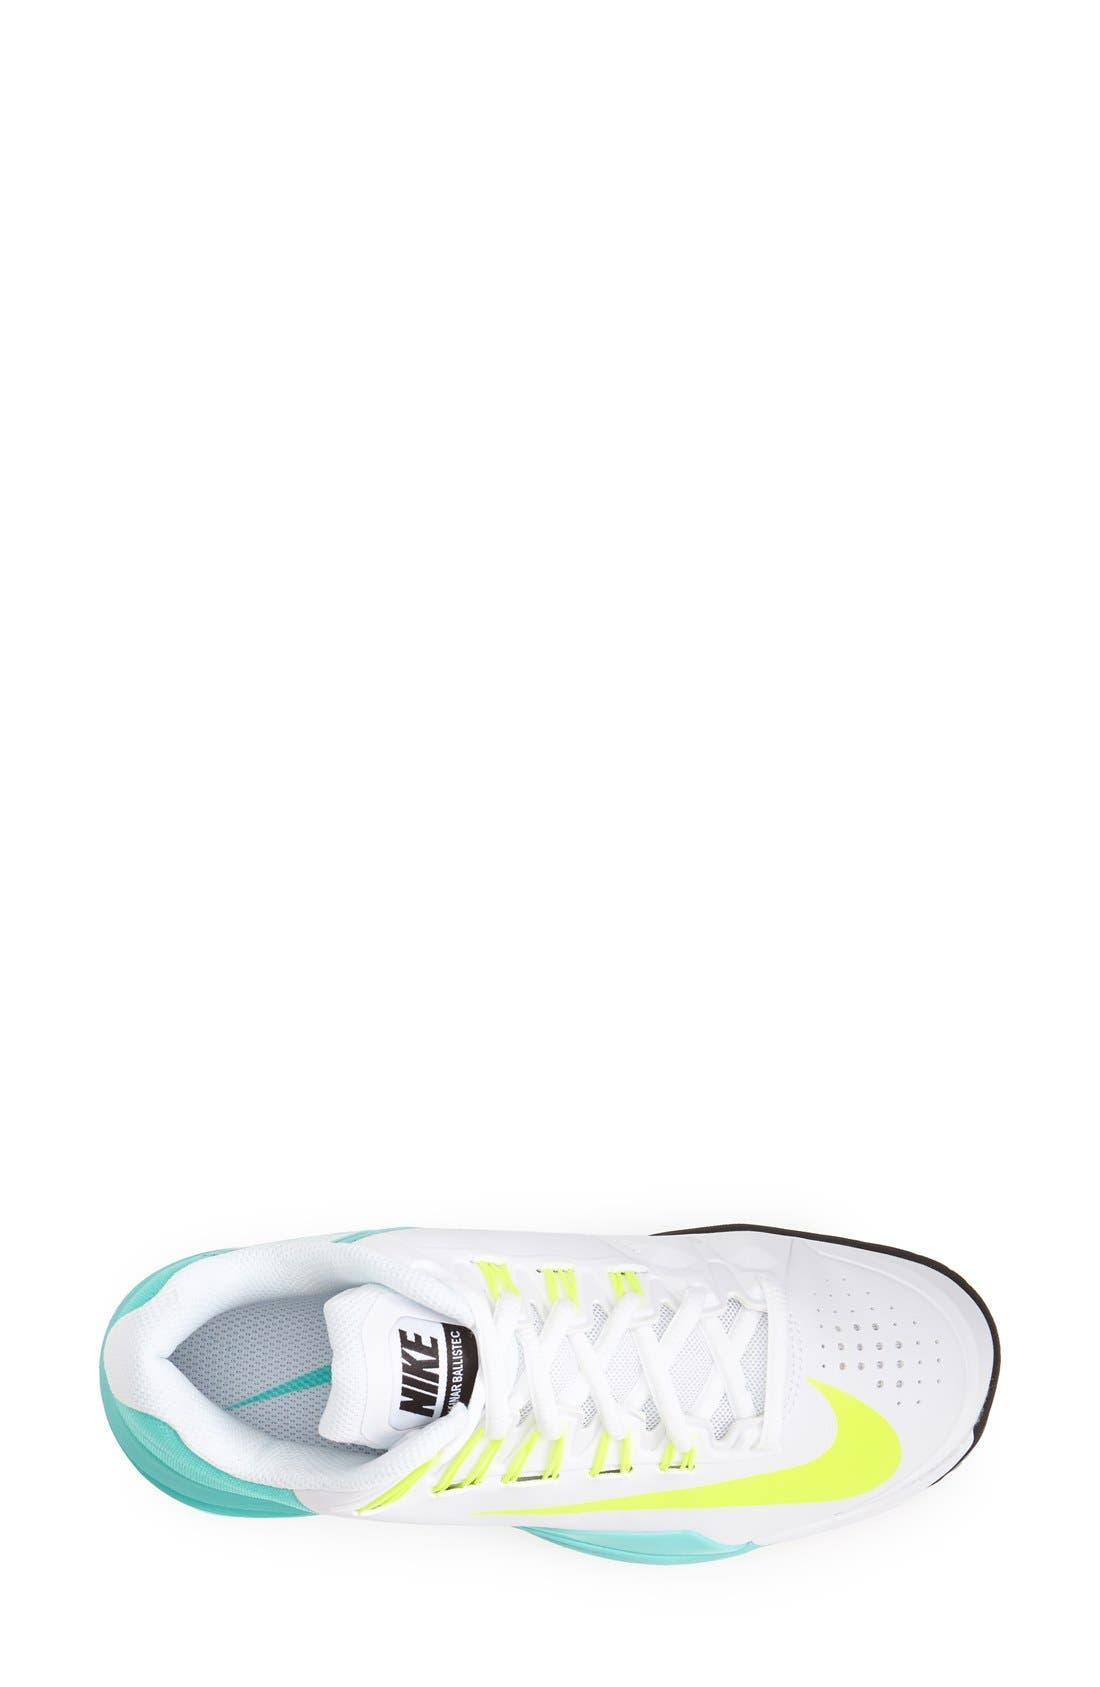 Alternate Image 3  - Nike 'Lunar Ballistec' Tennis Shoe (Women)